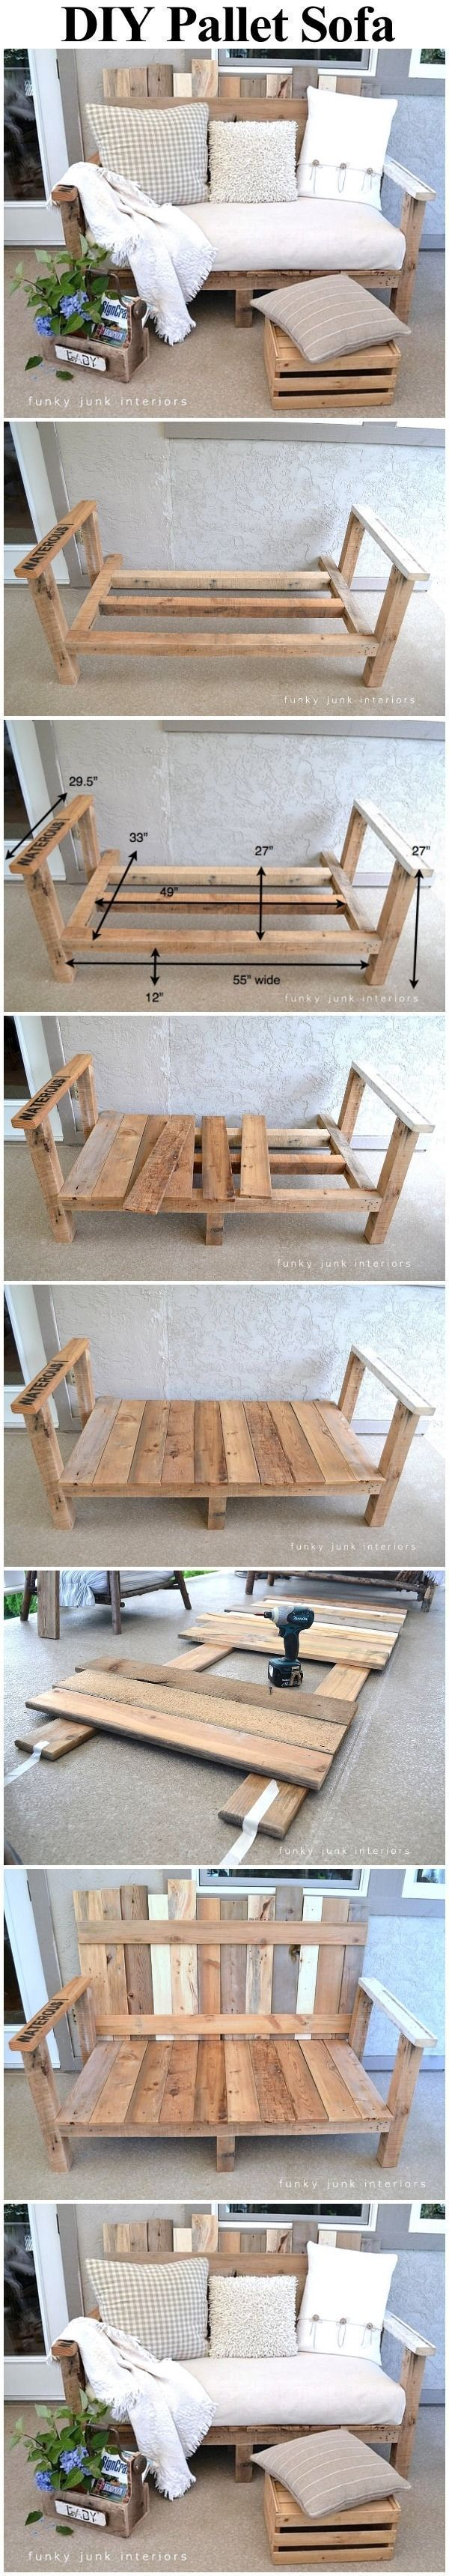 587 best Furniture Flip Ideas Future E&J endeavor images on